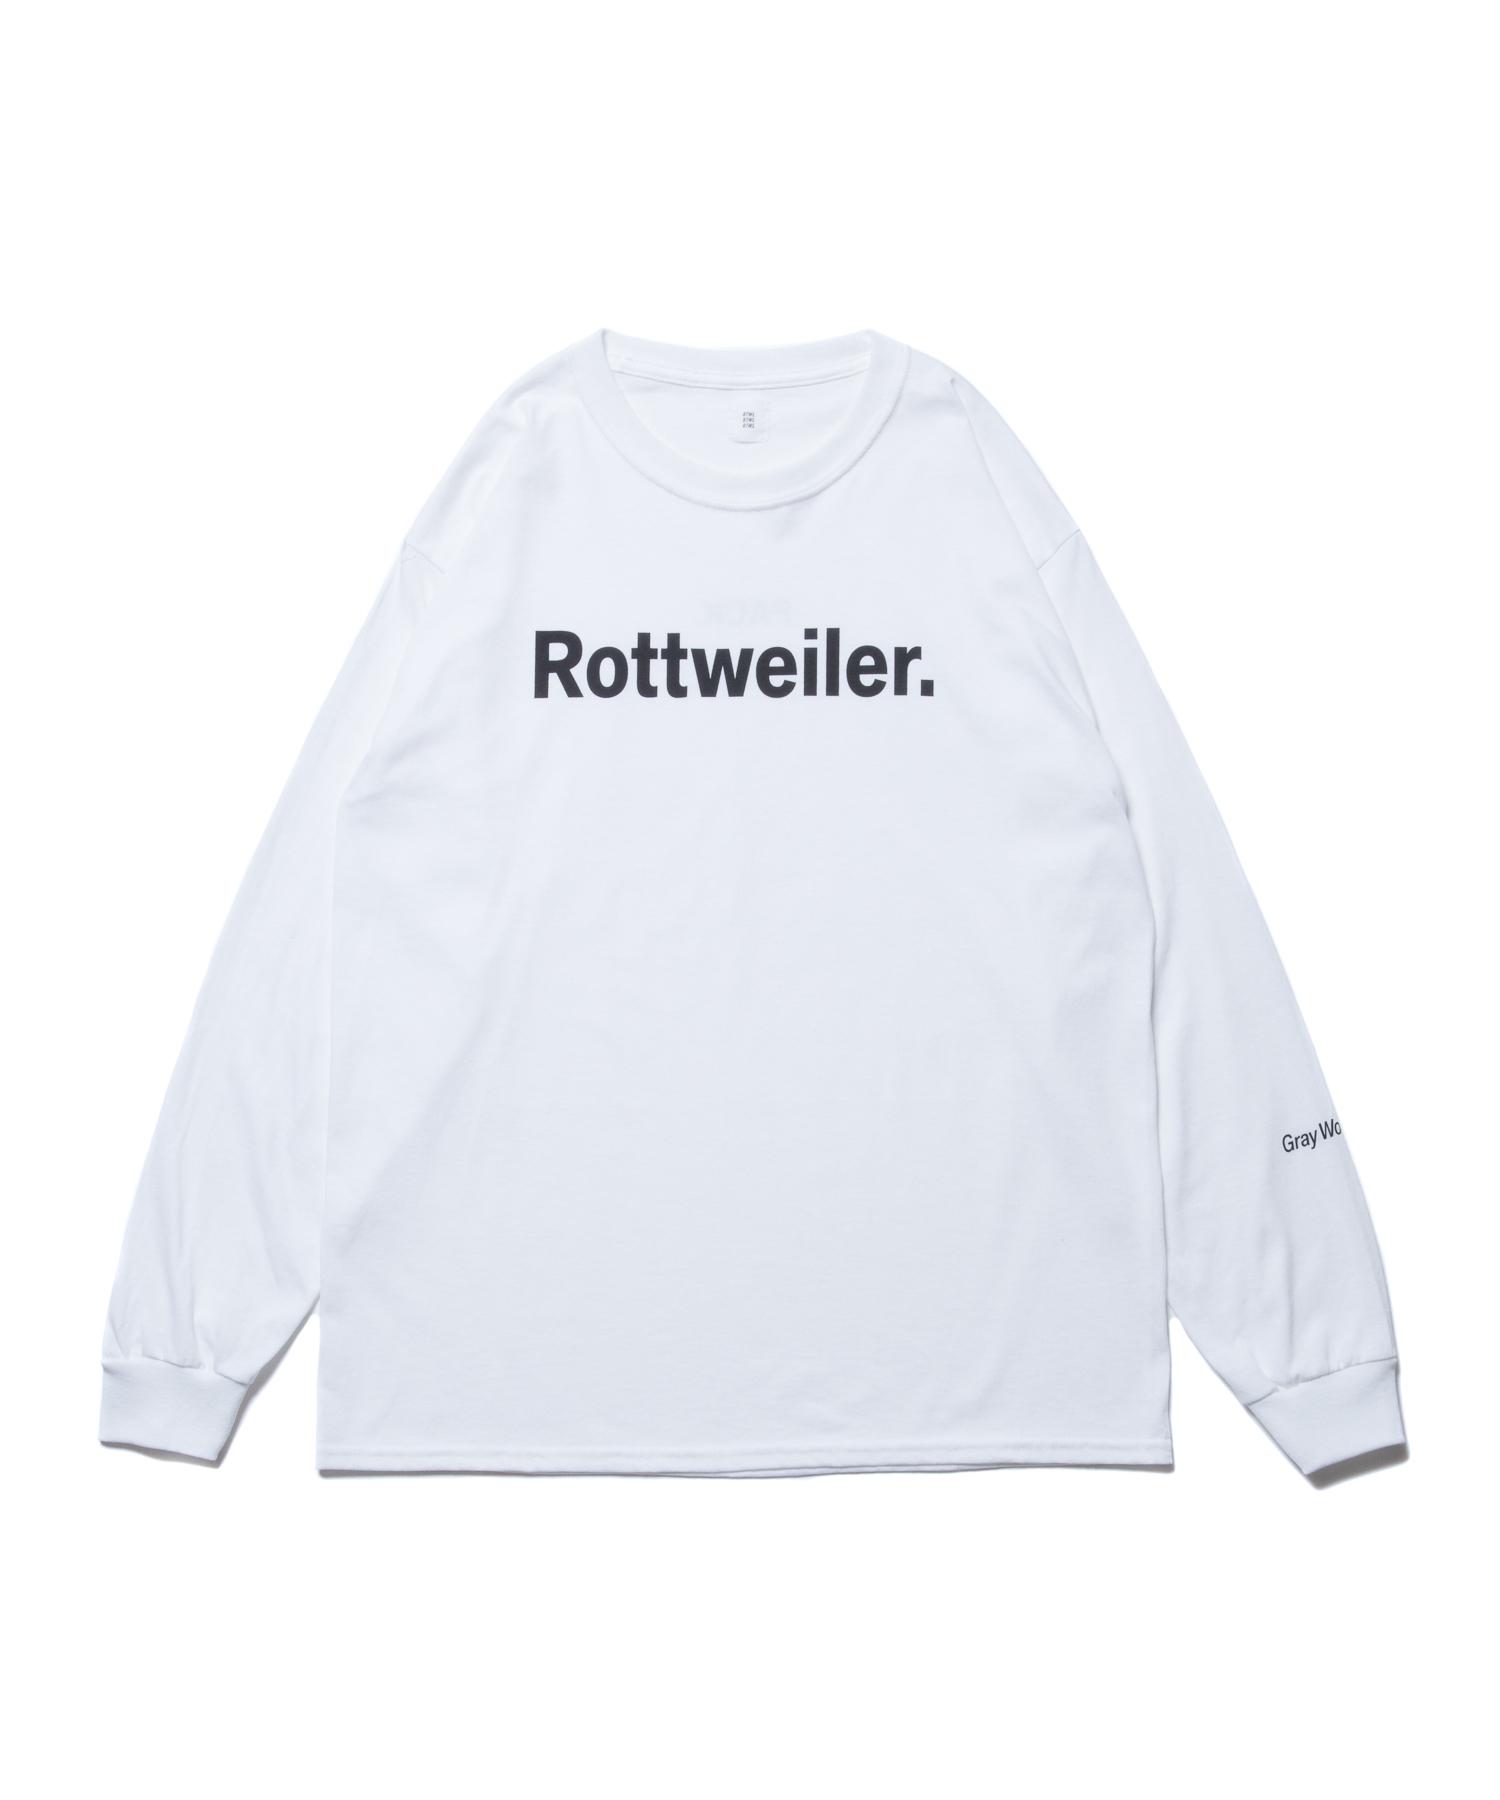 ROTTWEILER LS Tee